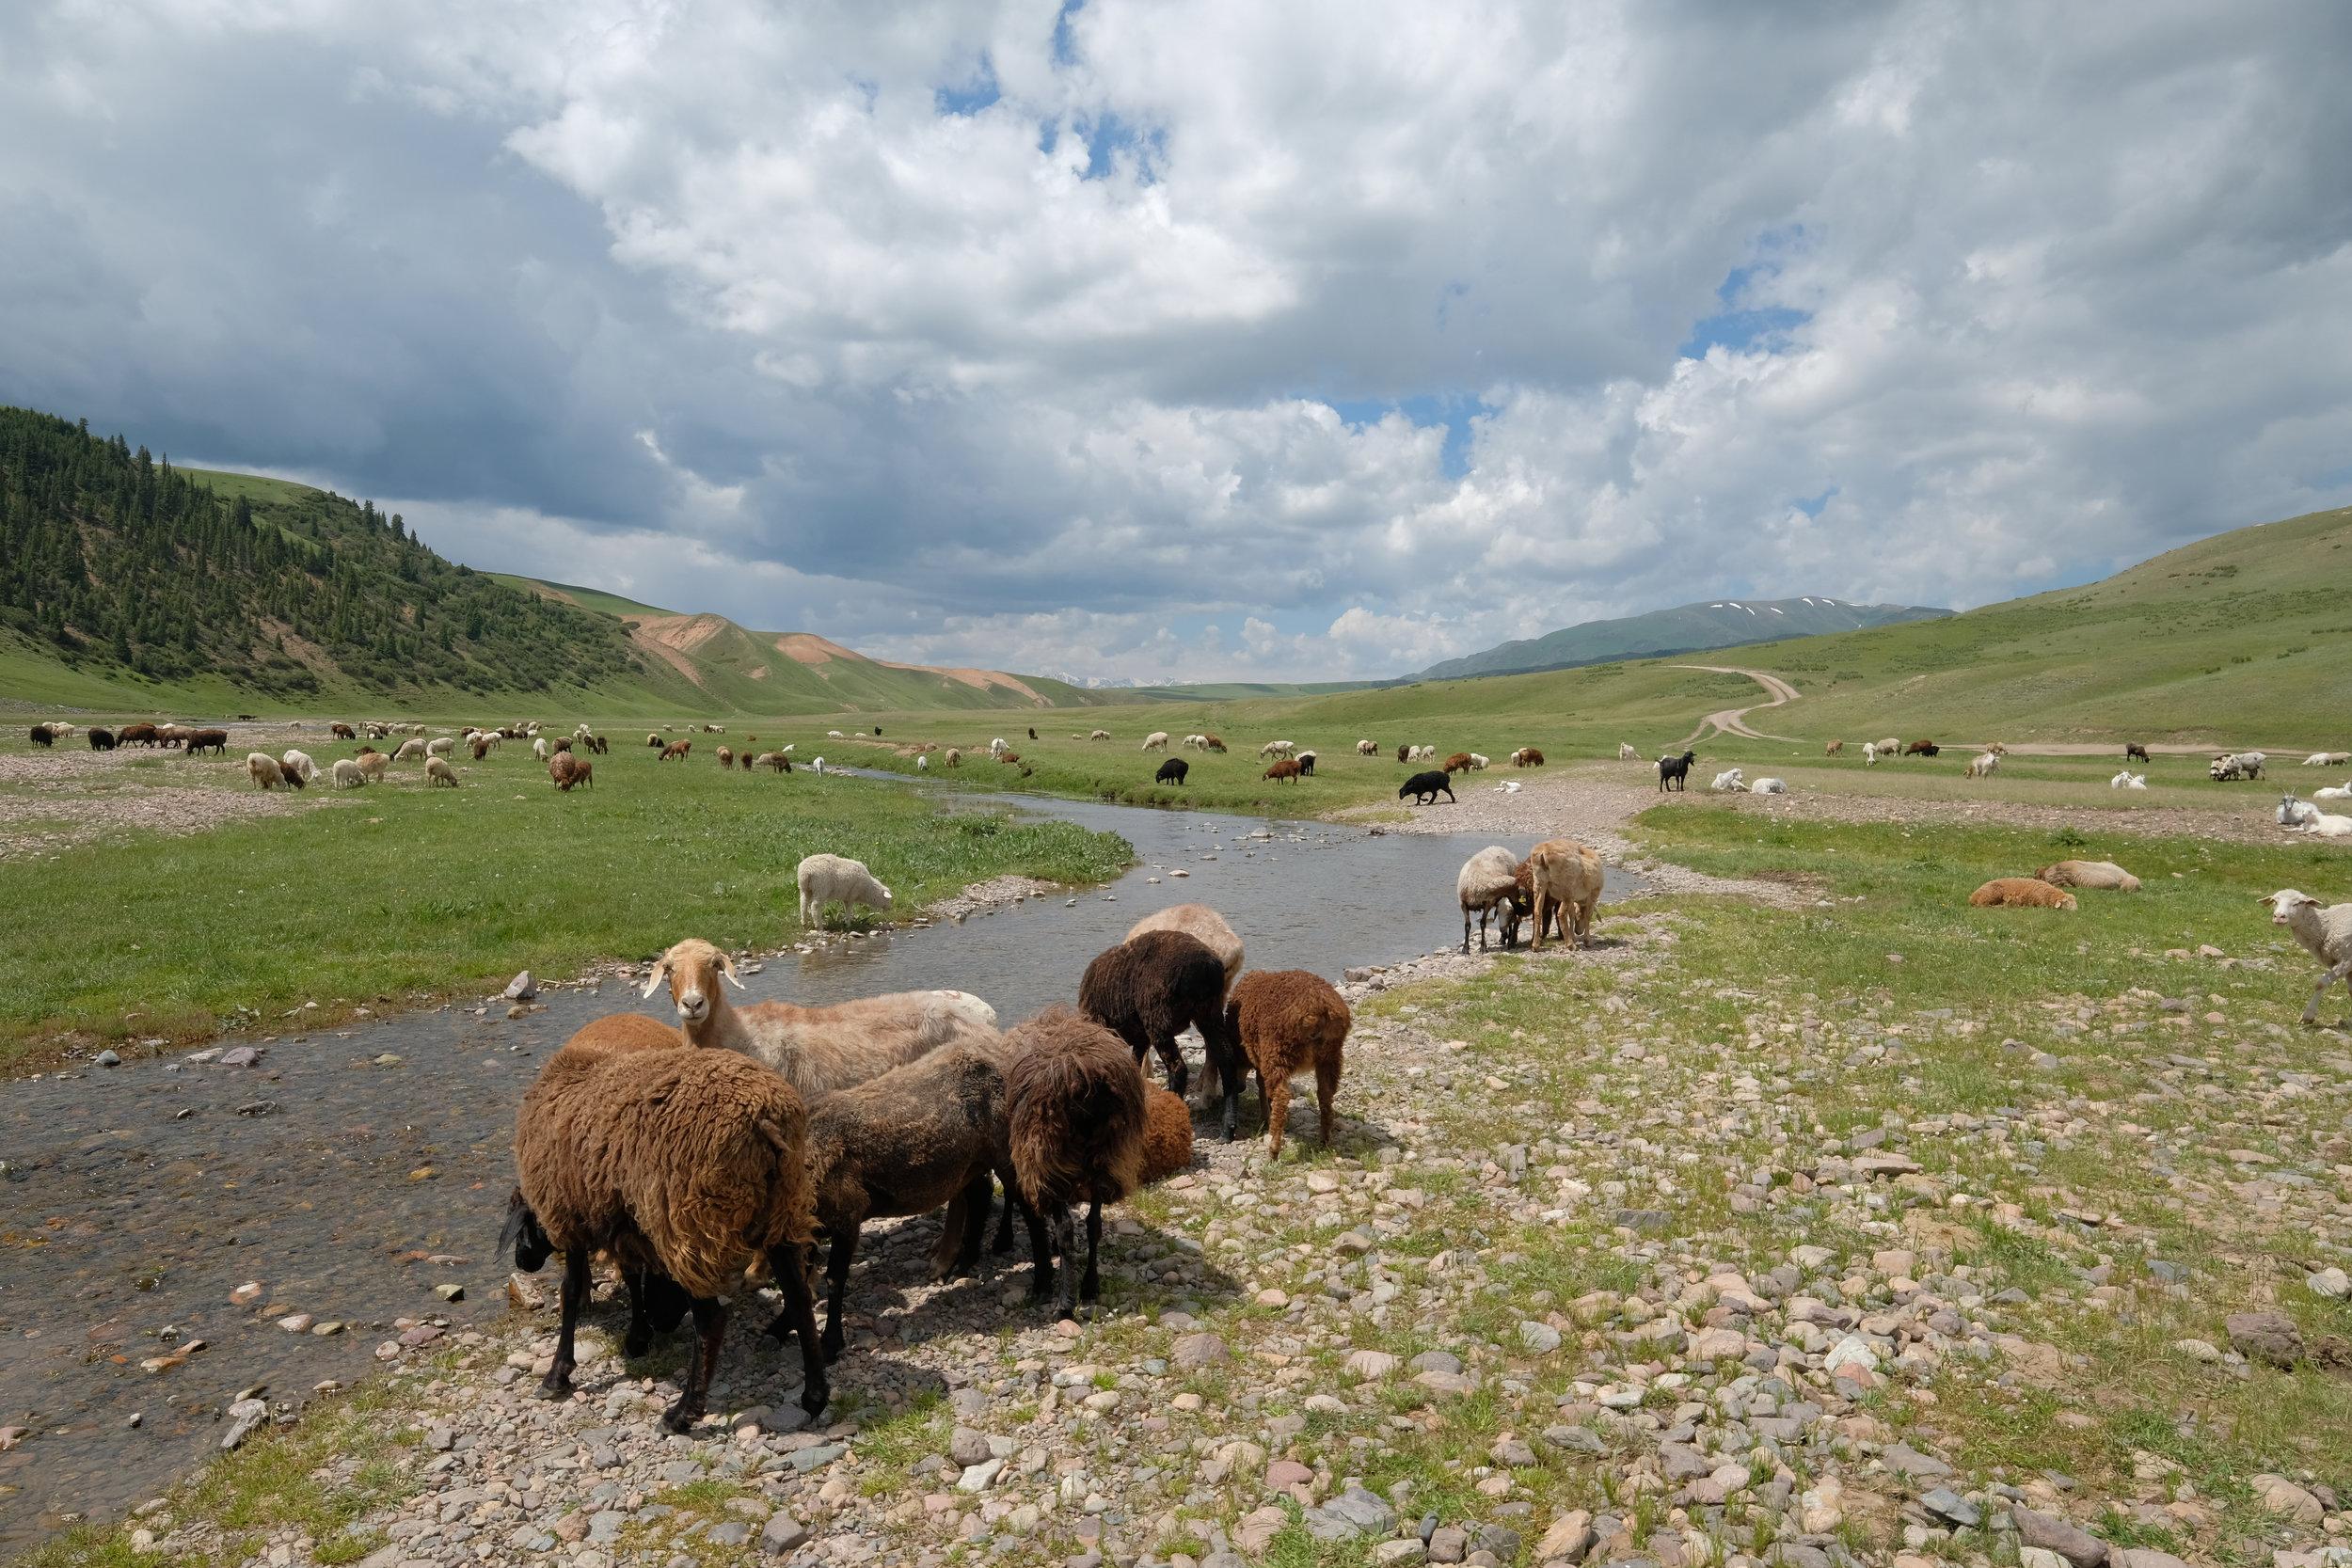 kazakh-corner-route-5207_35312240652_o.jpg